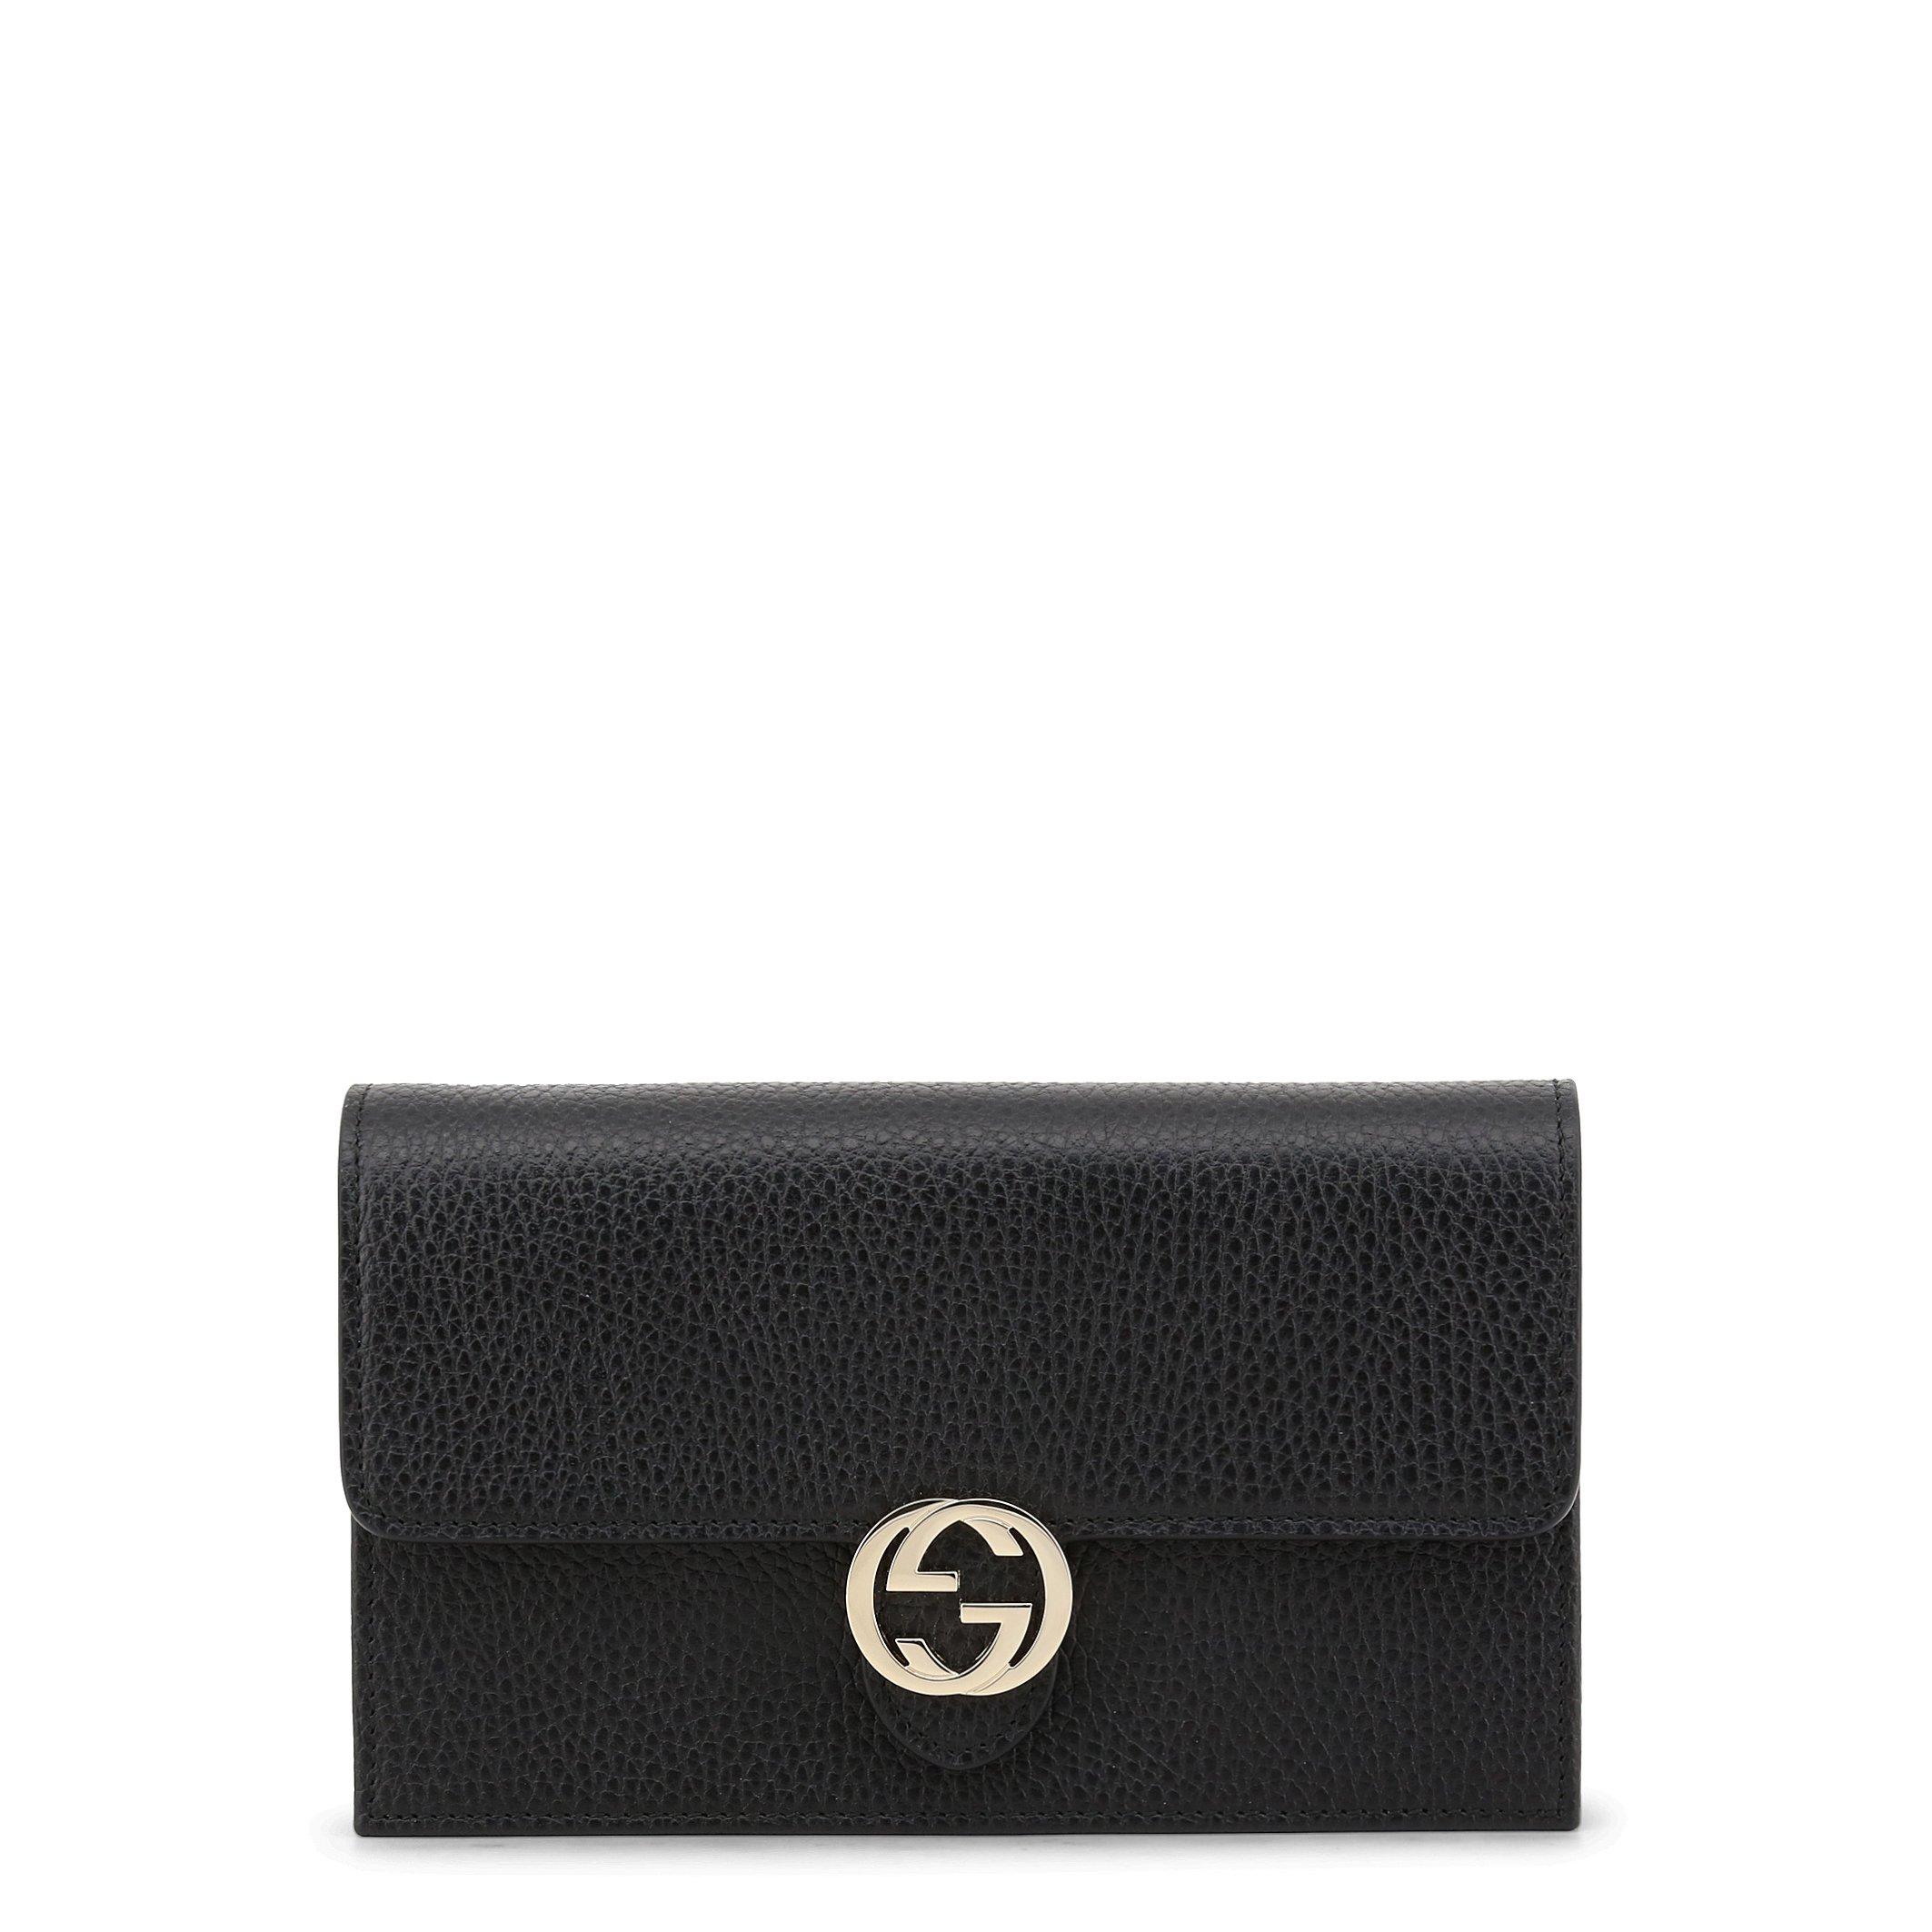 Gucci Women's Crossbody Bag Various Colours 510314_CA00G - black NOSIZE